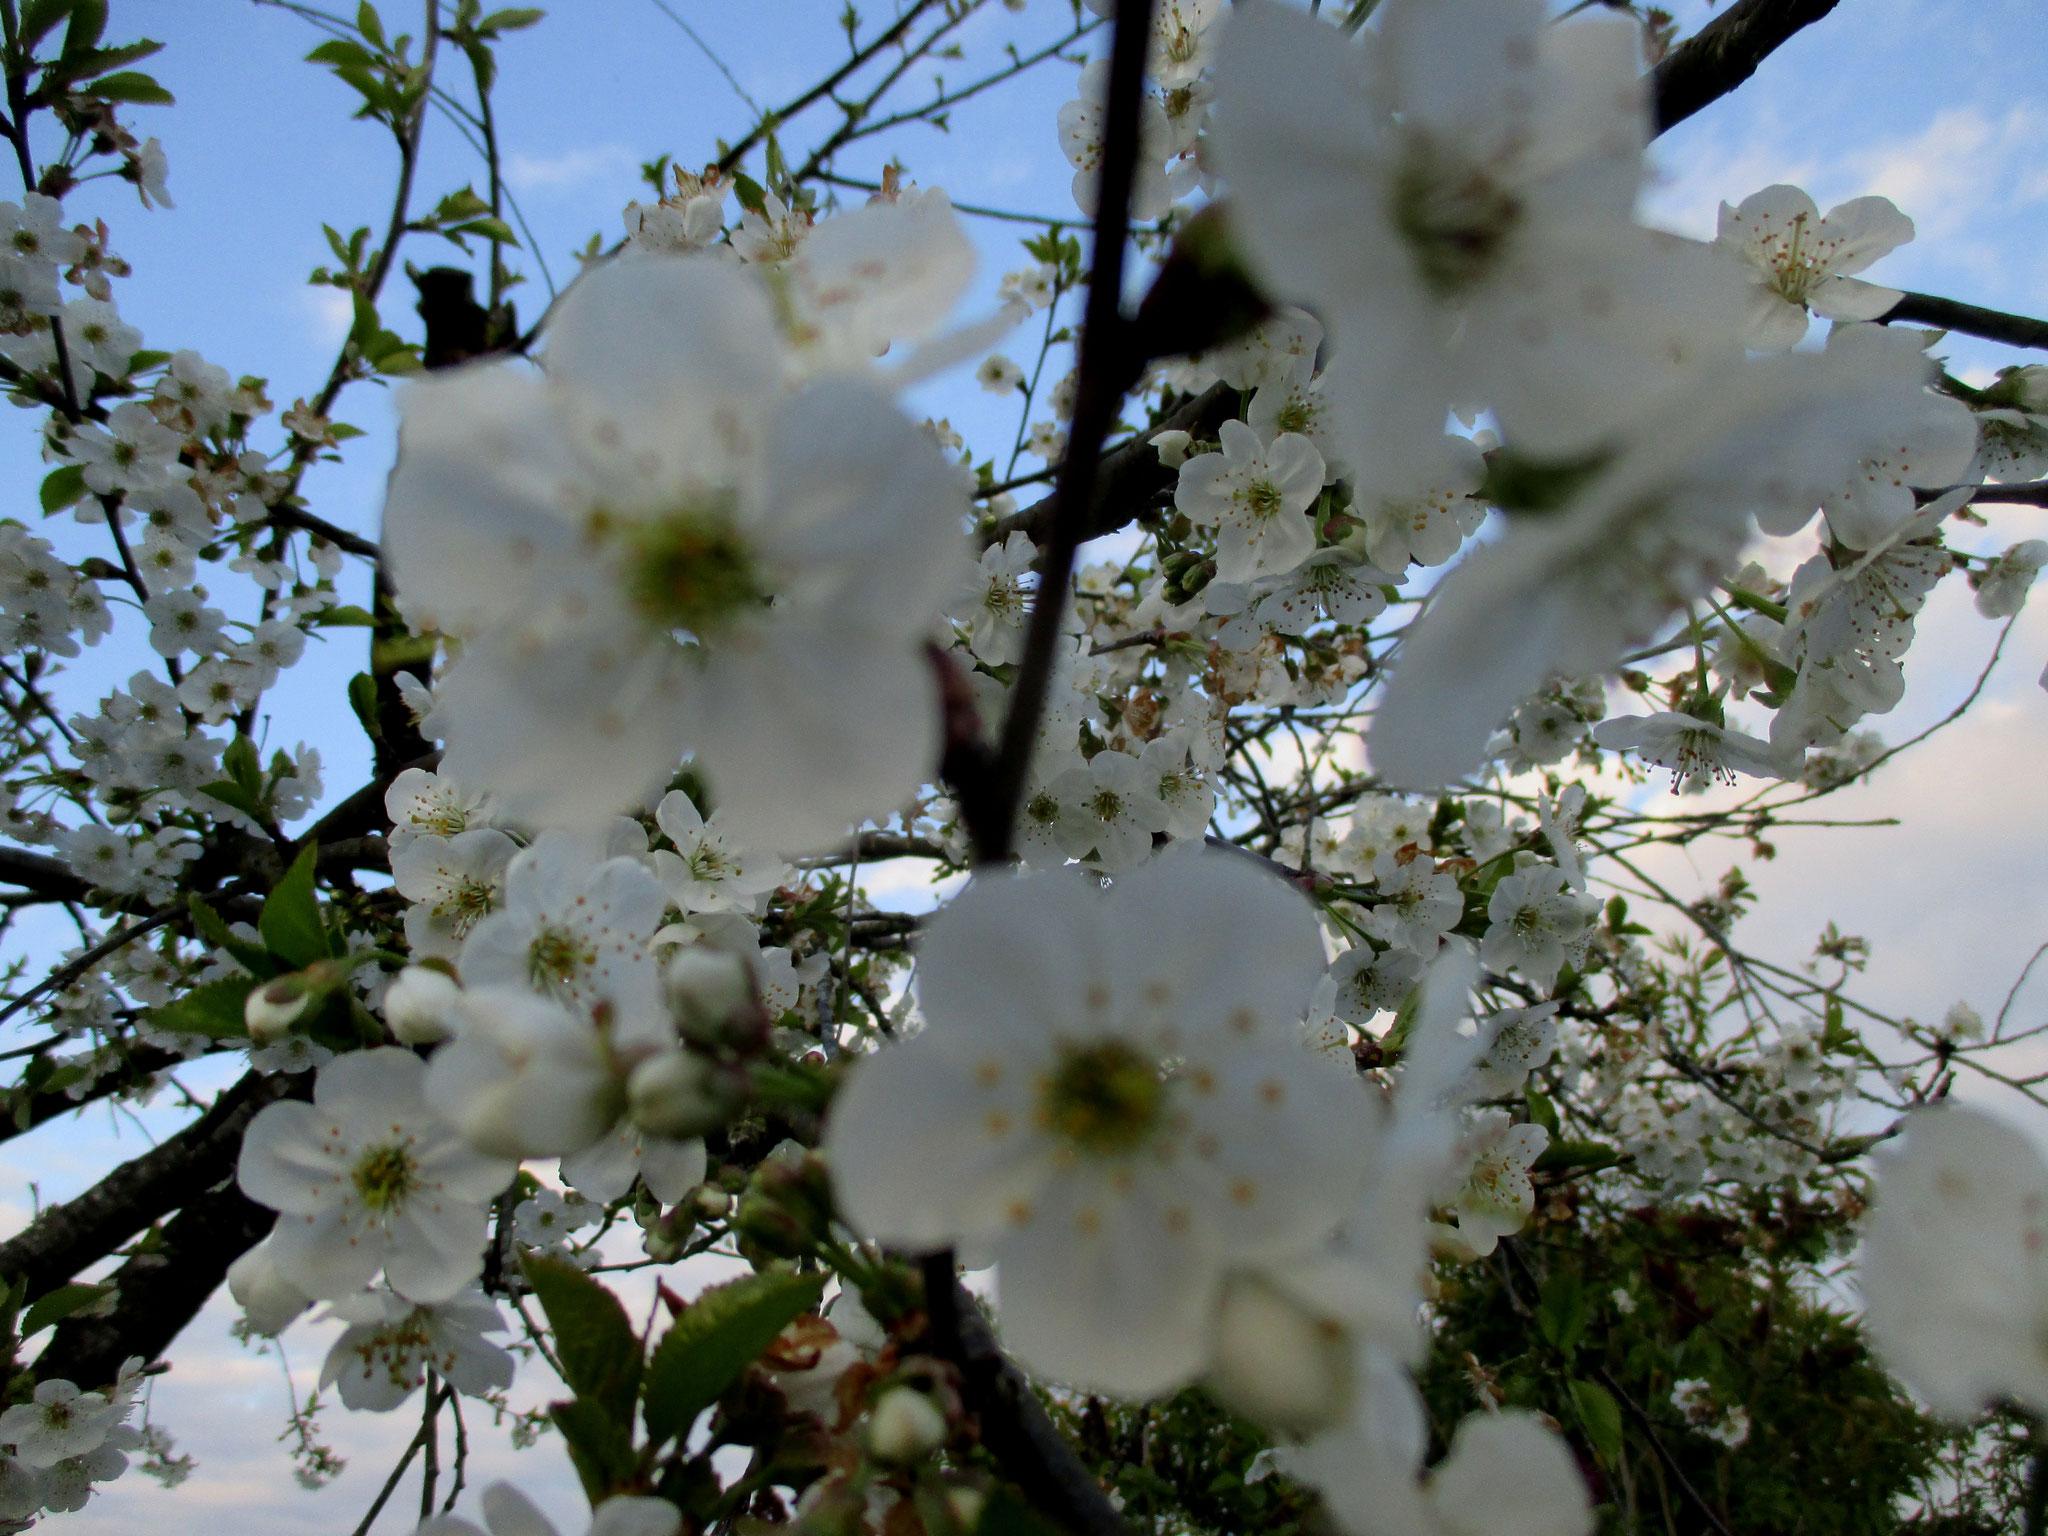 Le cerisier en fleur, en Anjou